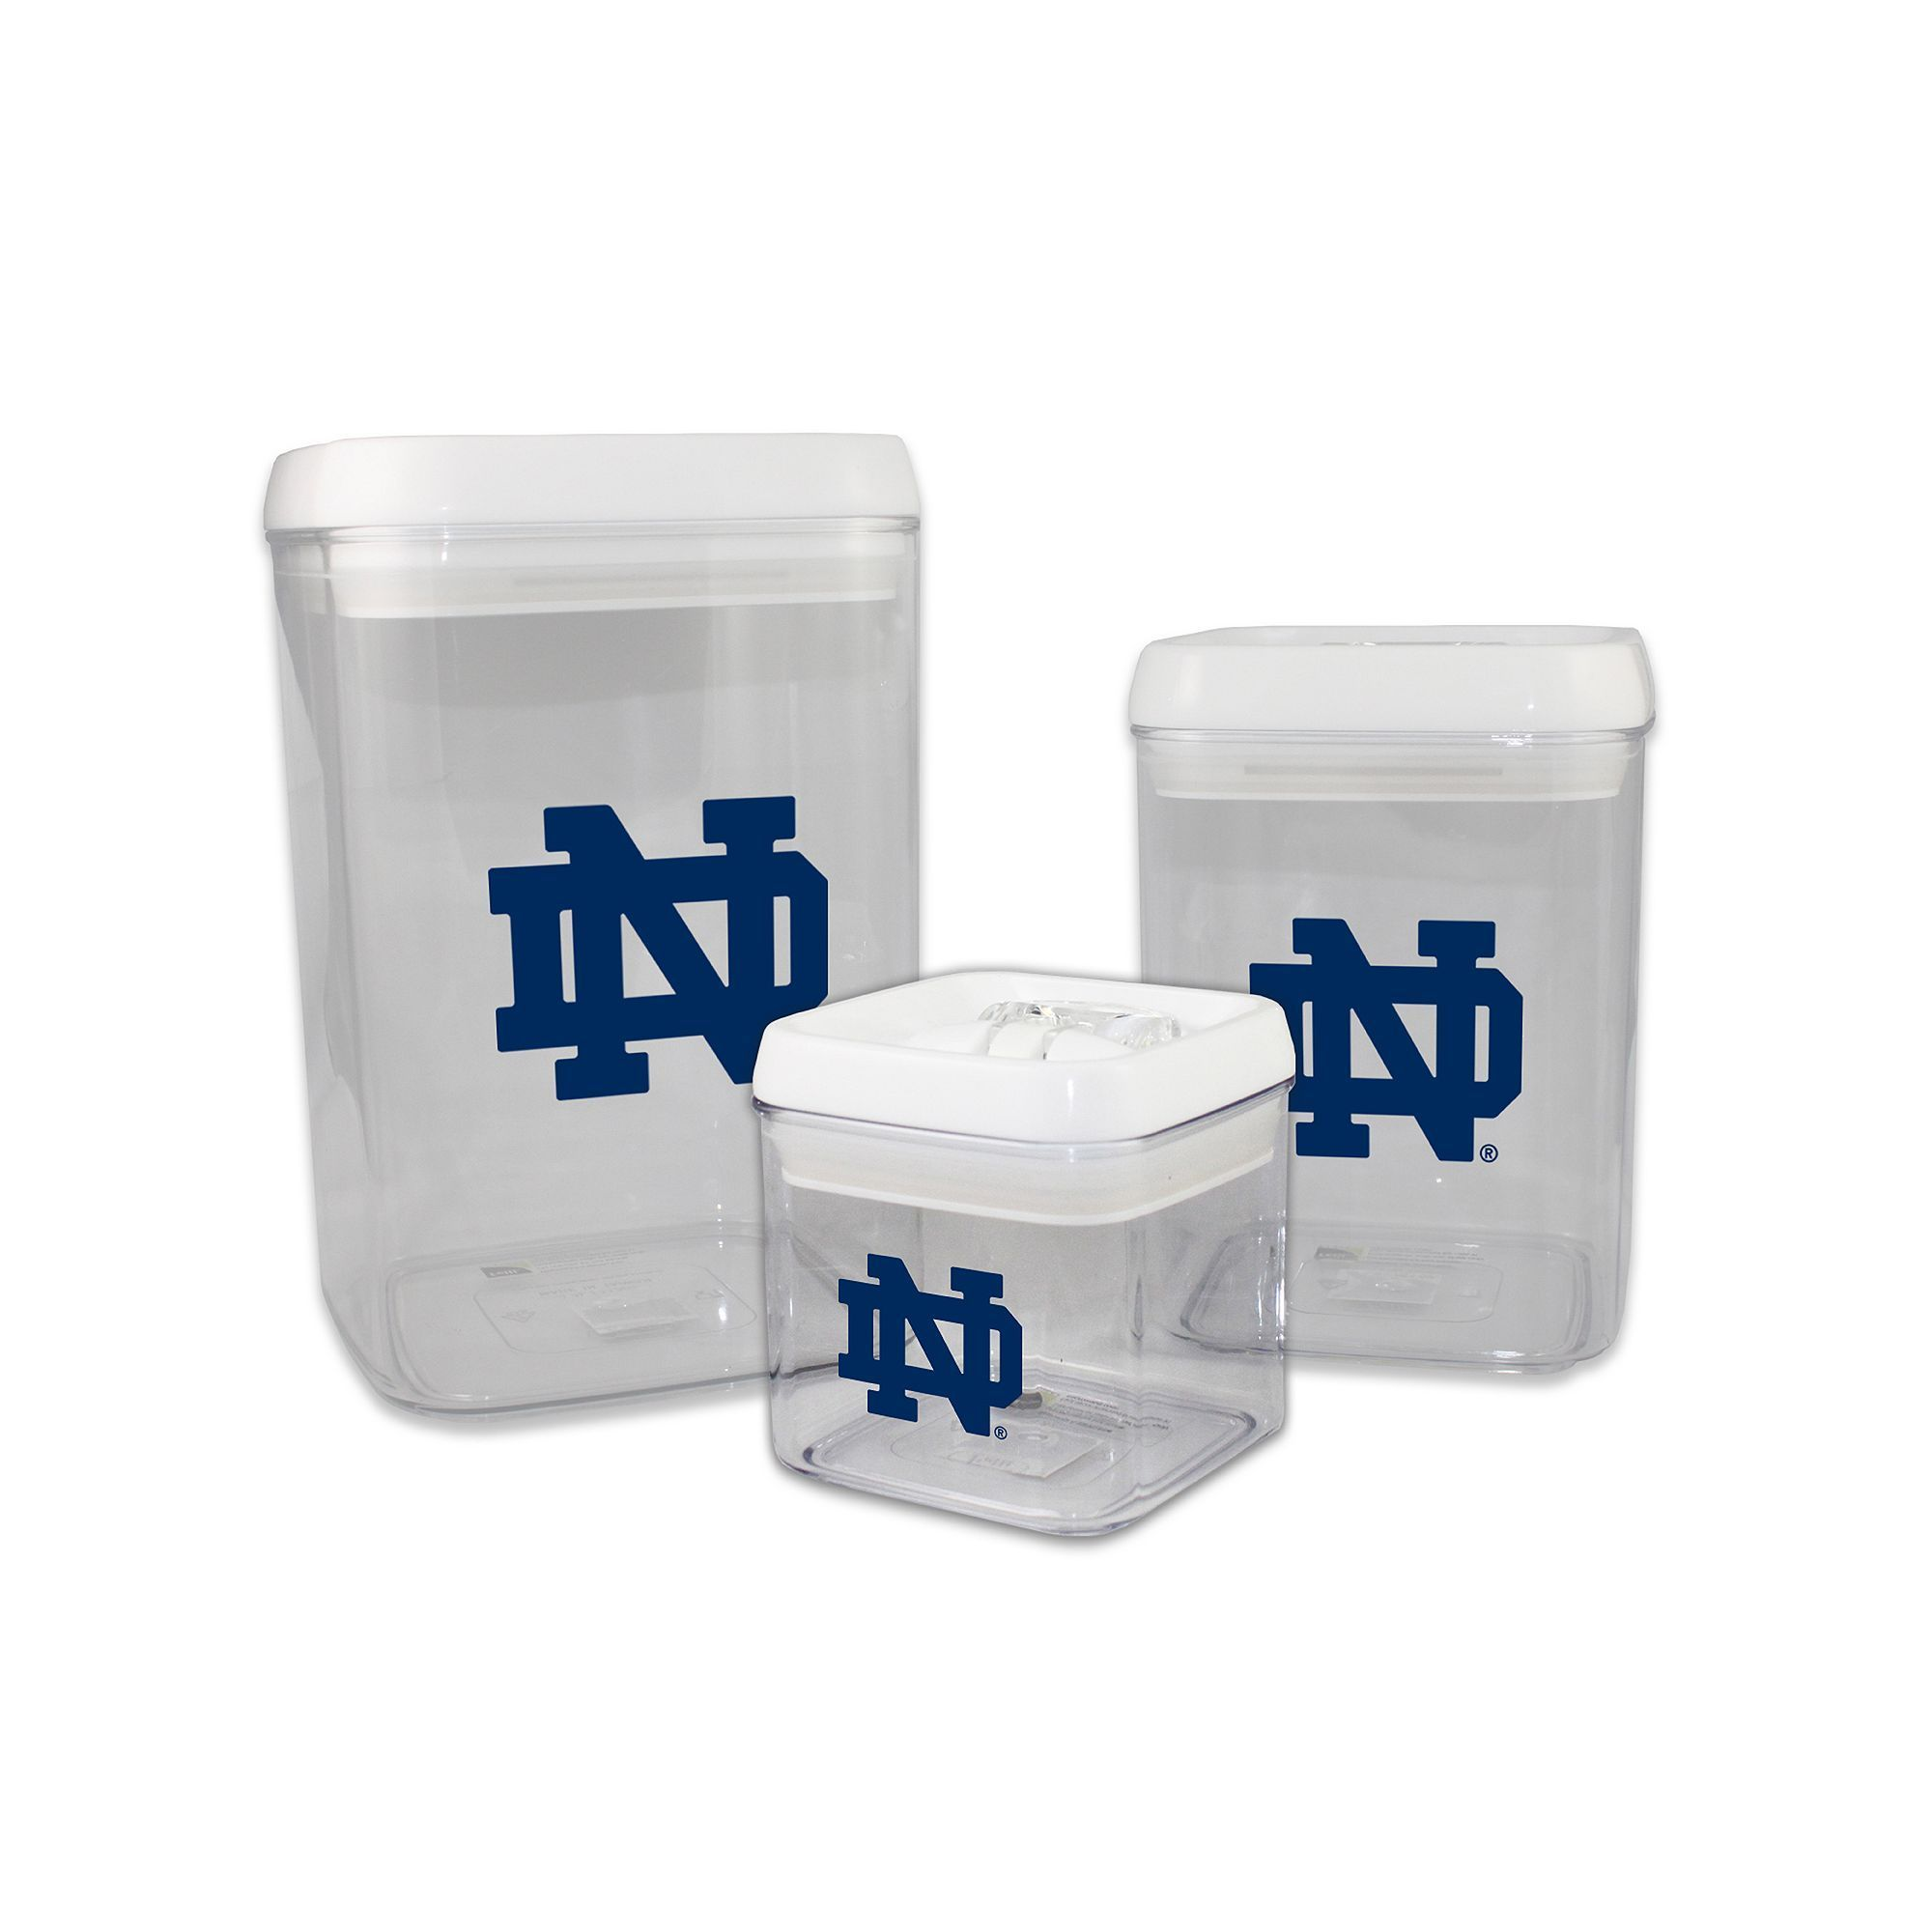 Notre Dame Fighting Irish 3 Piece Storage Container Set Multicolor